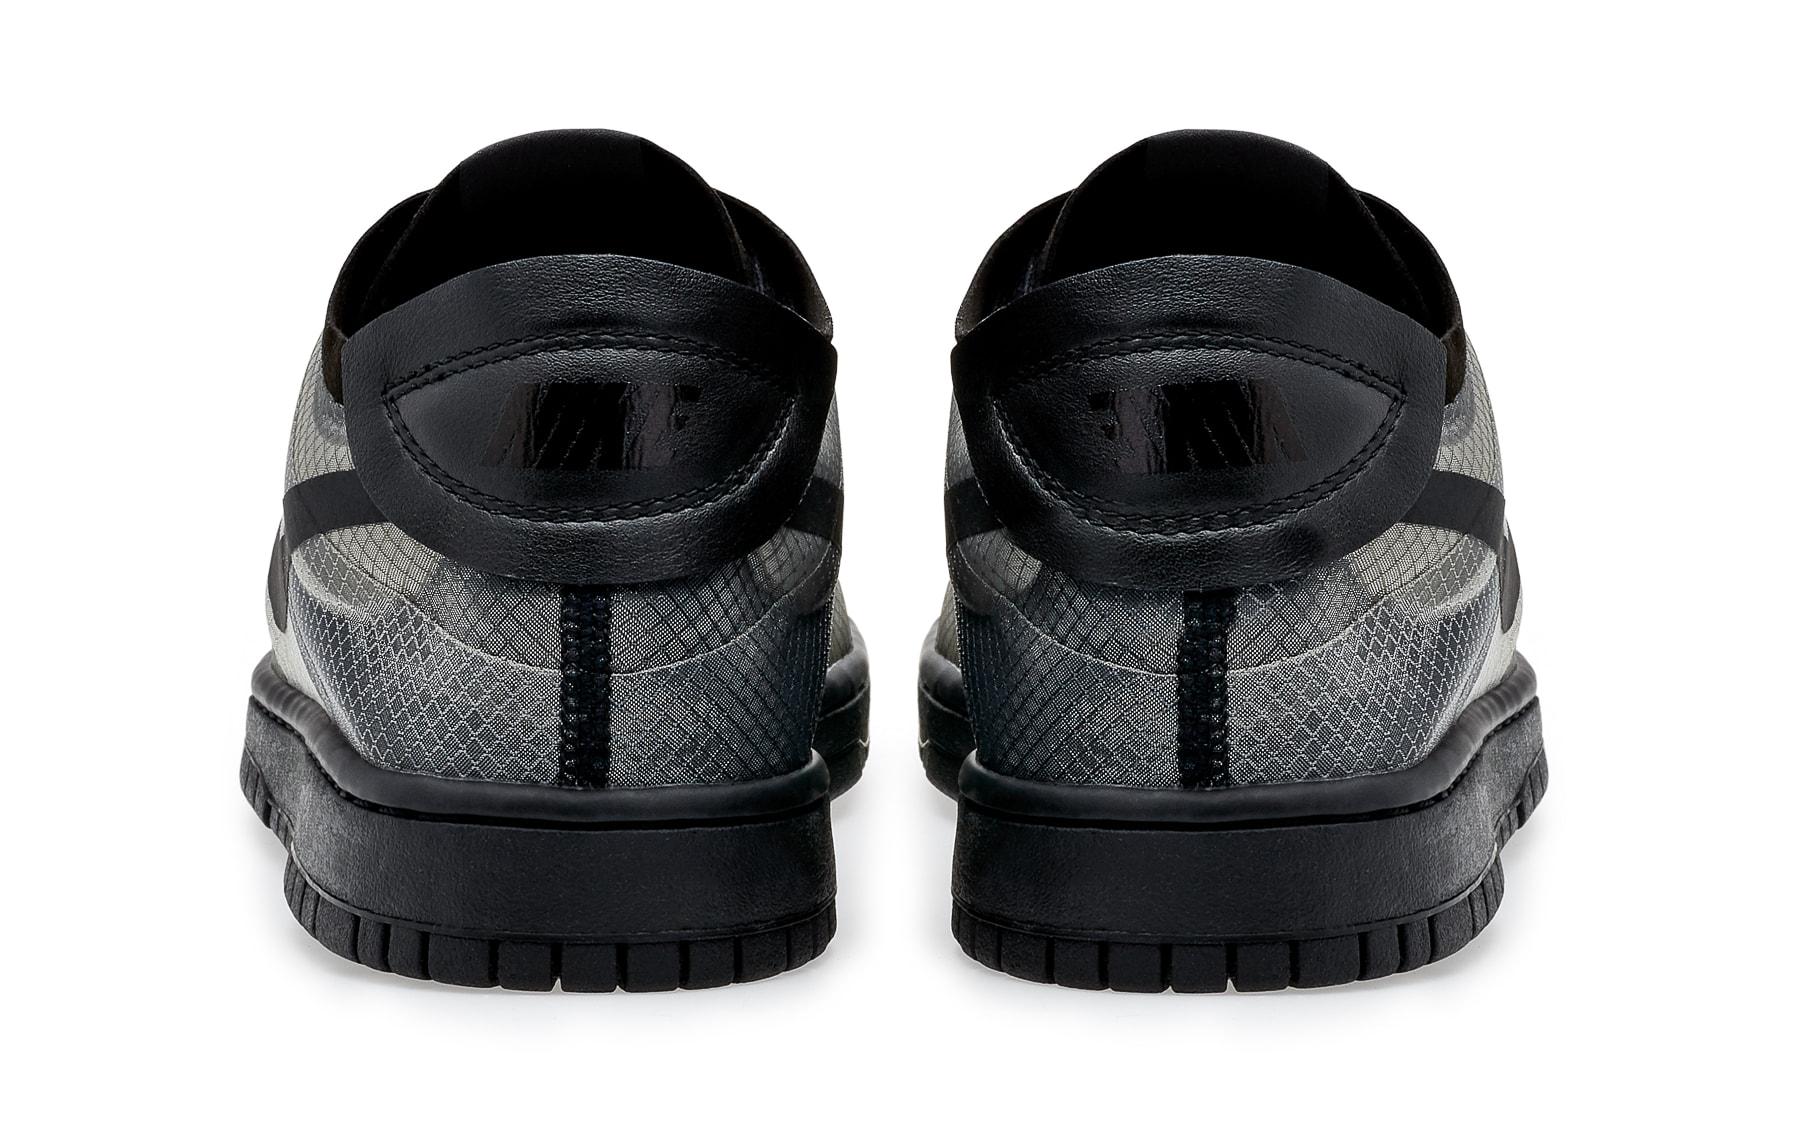 Comme Des Garcons x Nike Dunk Low Heel